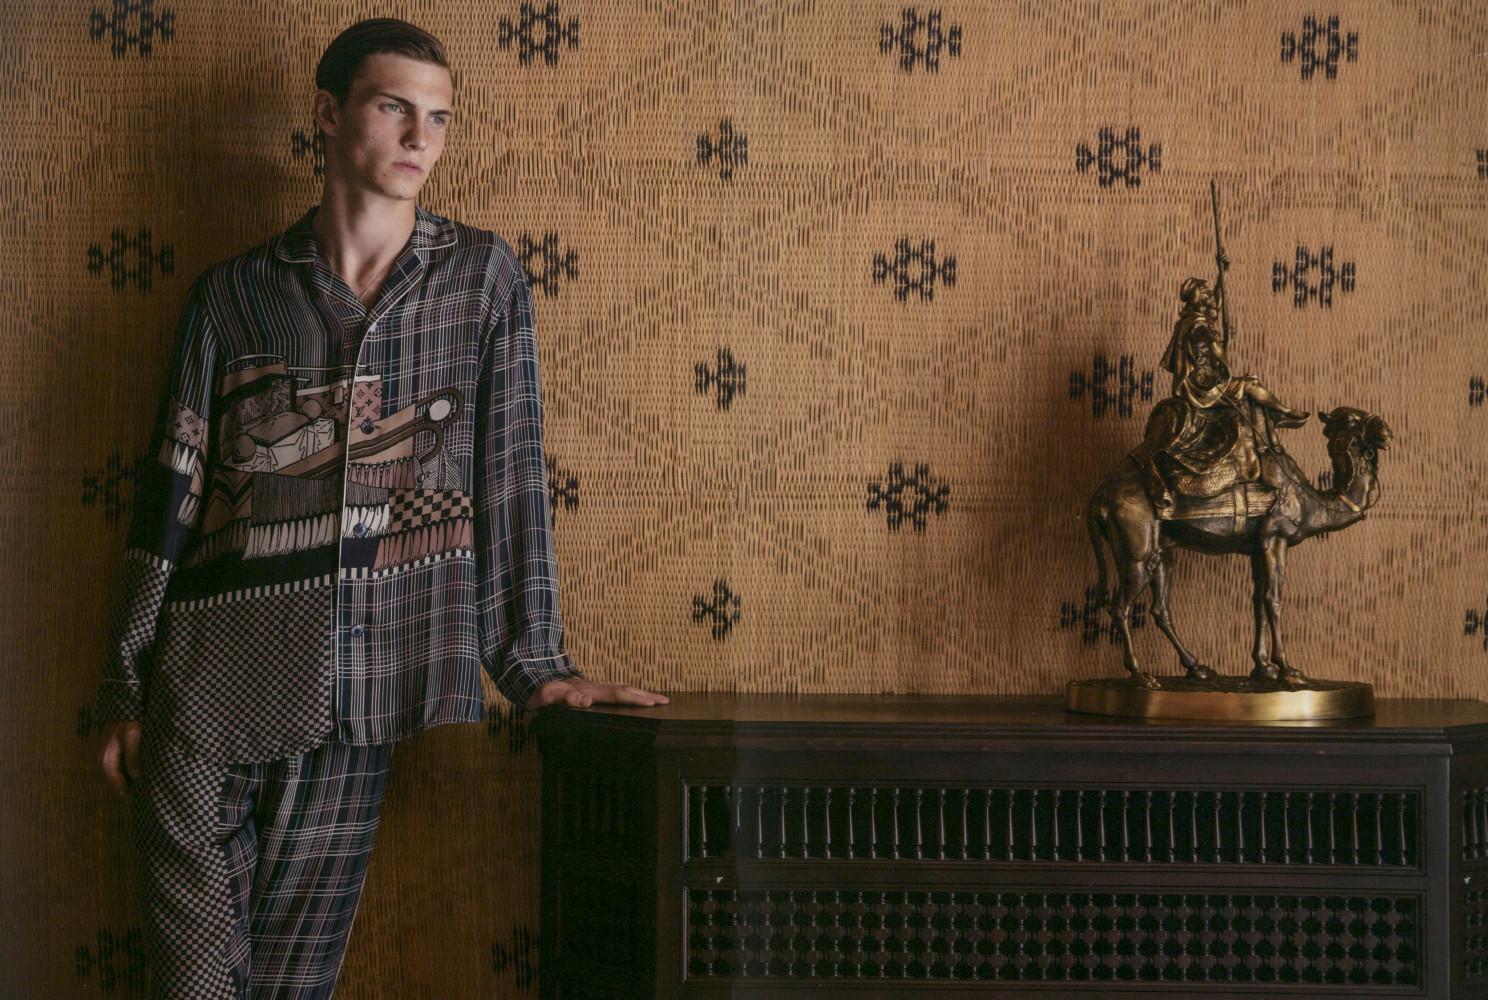 Luc Defont for Fashion for Men by Milan Vukmirovic